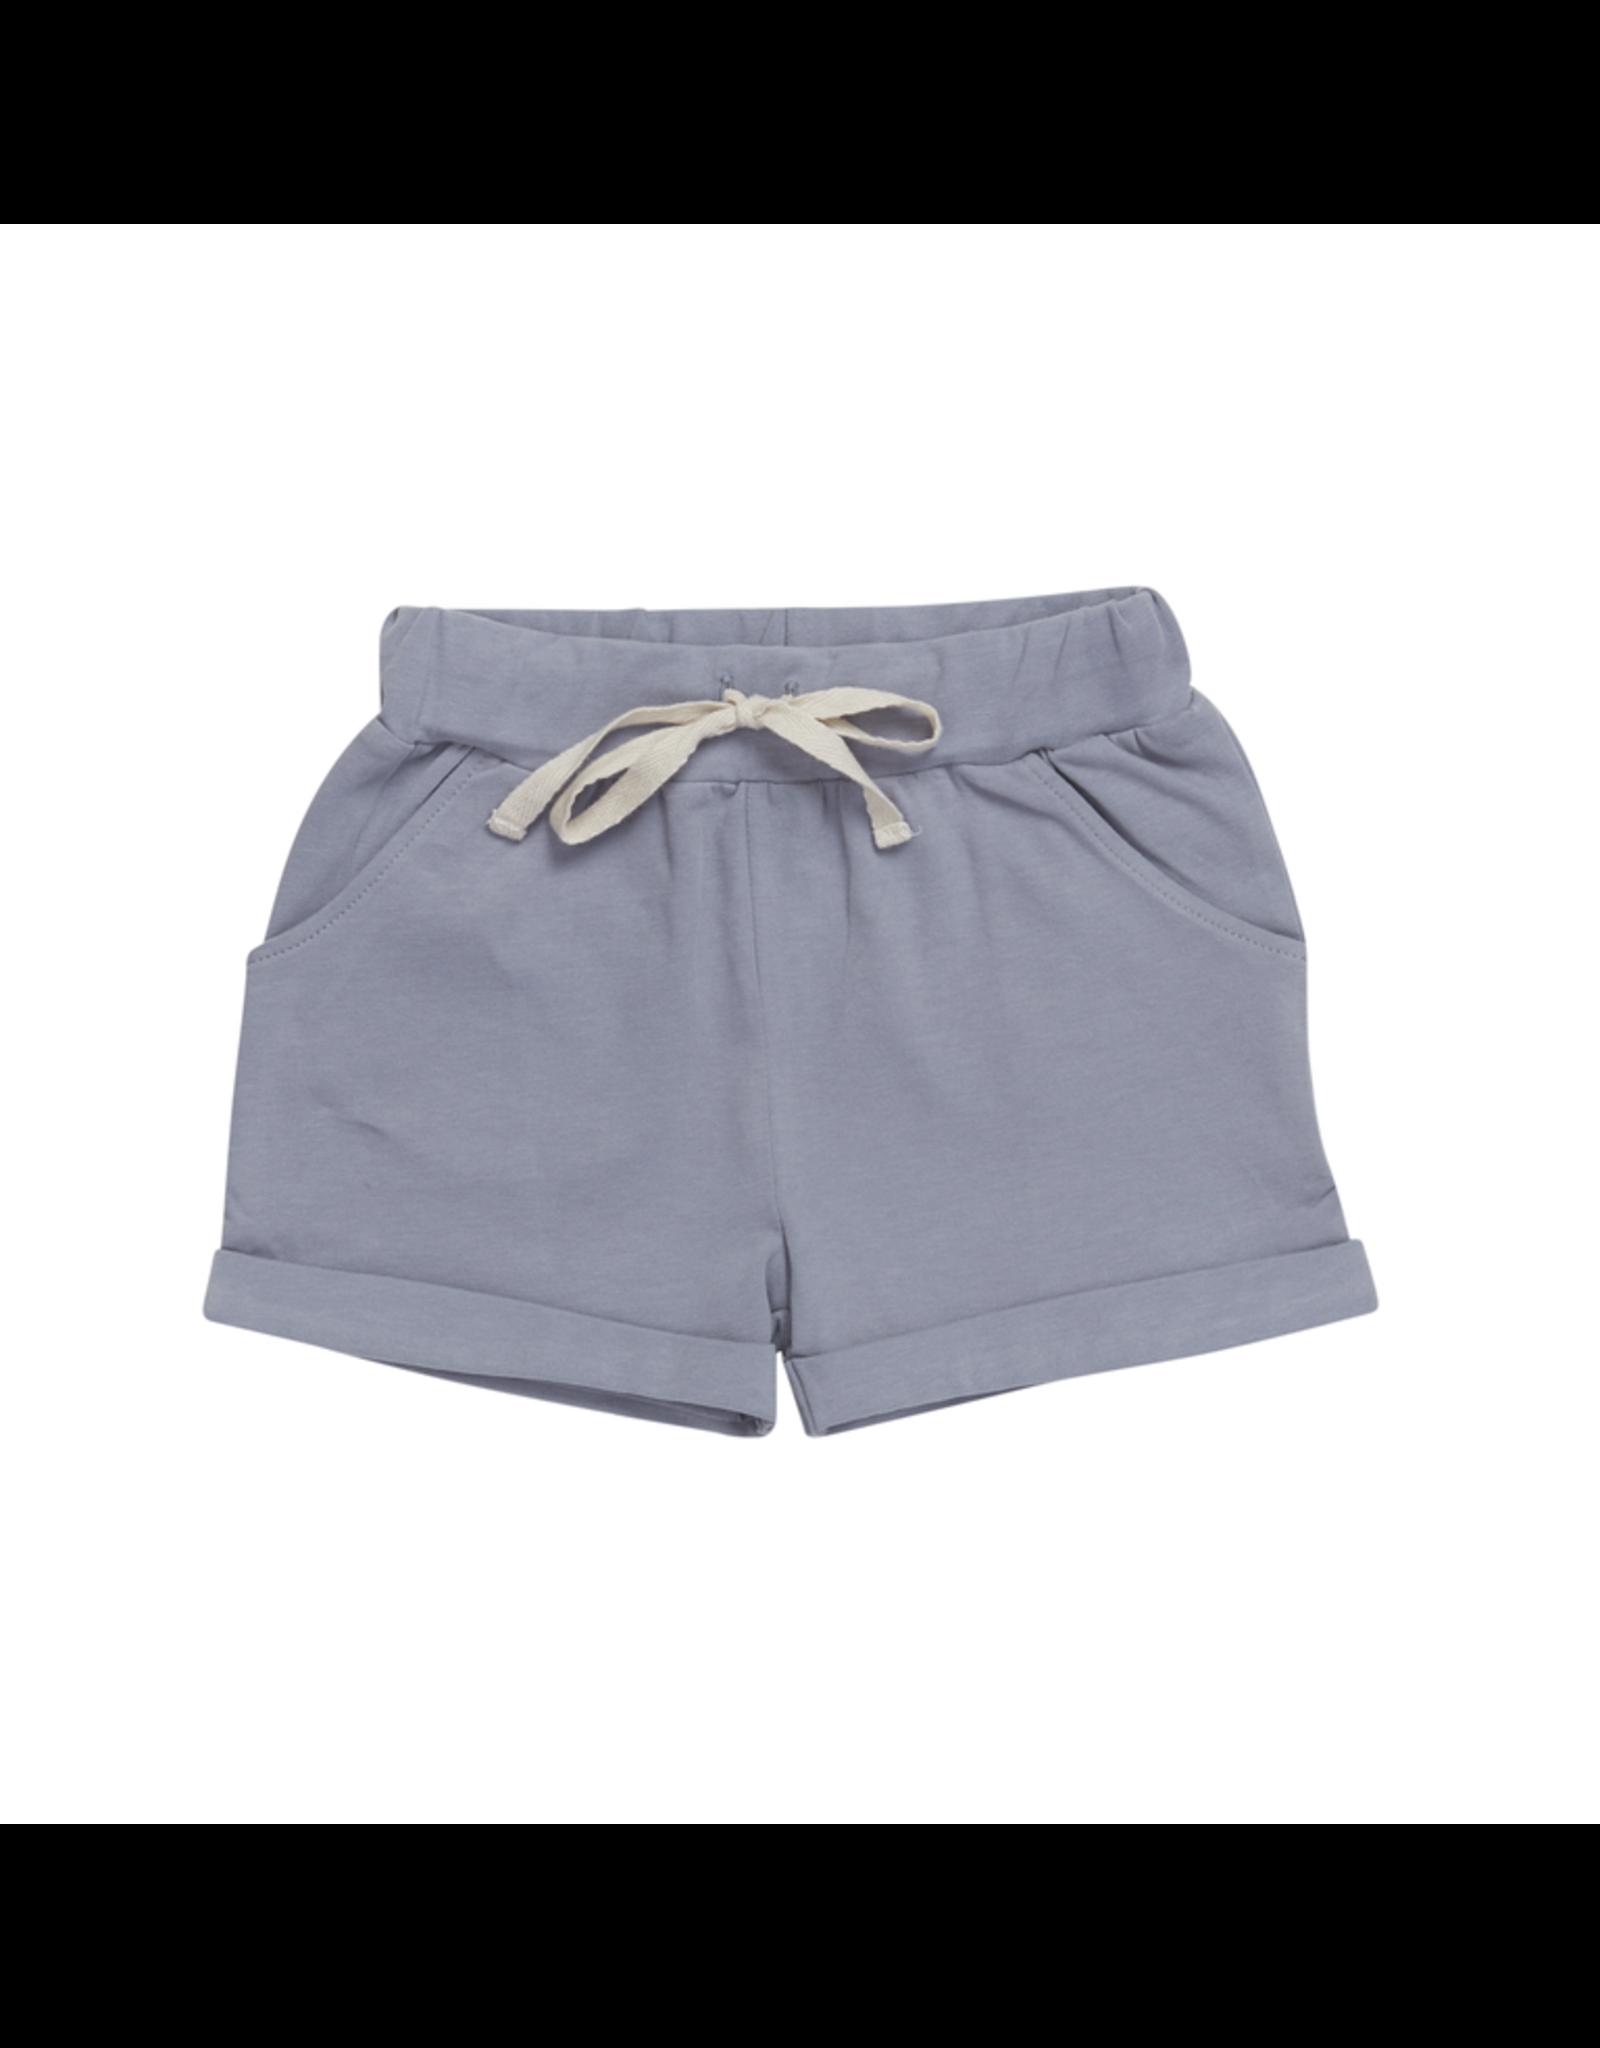 Blossom Kids Blossom Kids - Shorts - Blue Grey